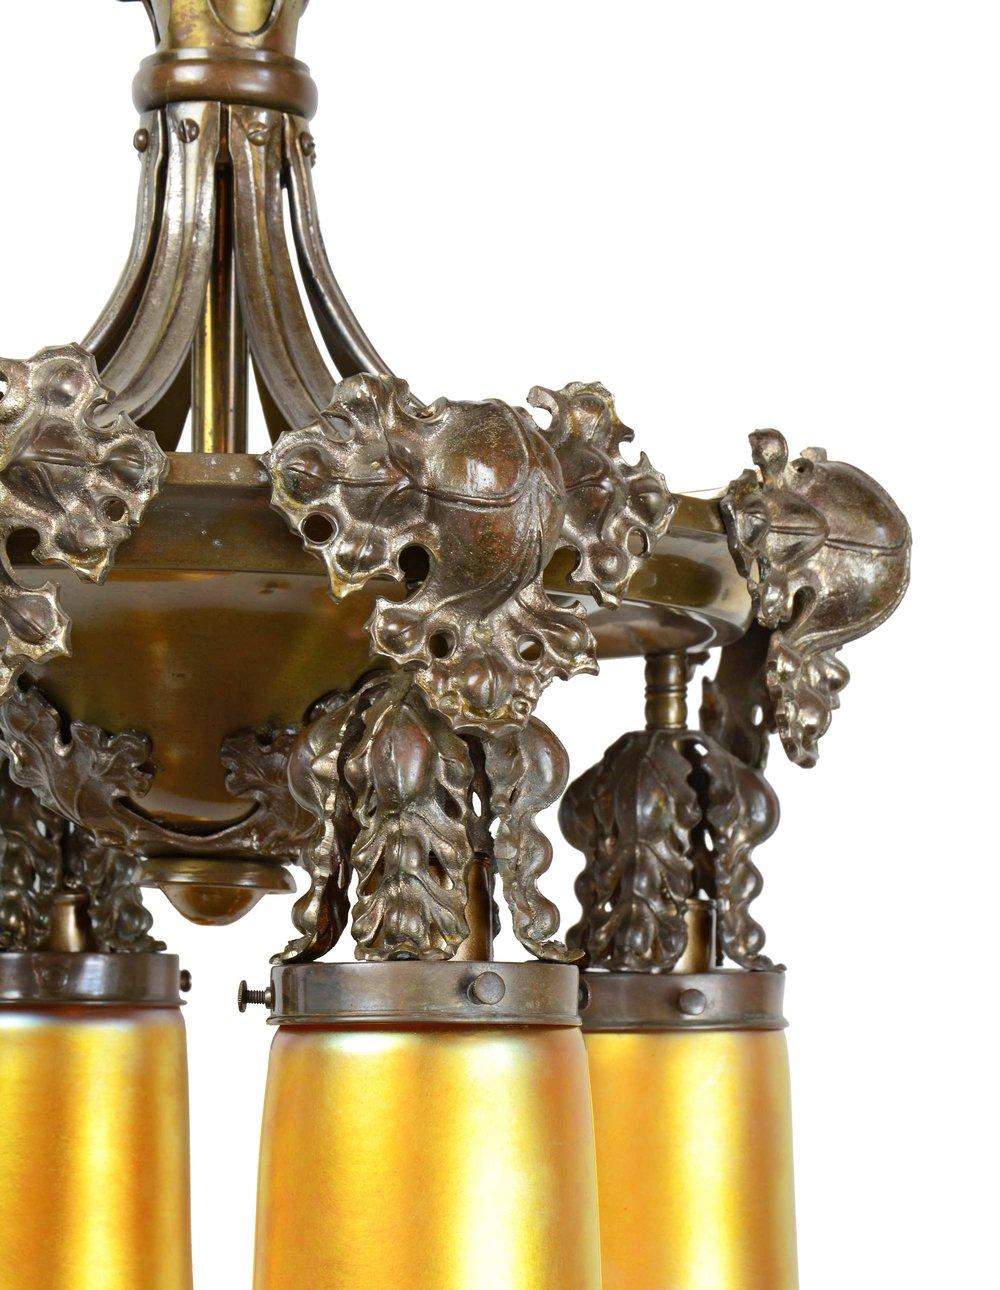 45255-cast-brass-crocket-chandelier-with-quezal-shades-crocket-detail.jpg